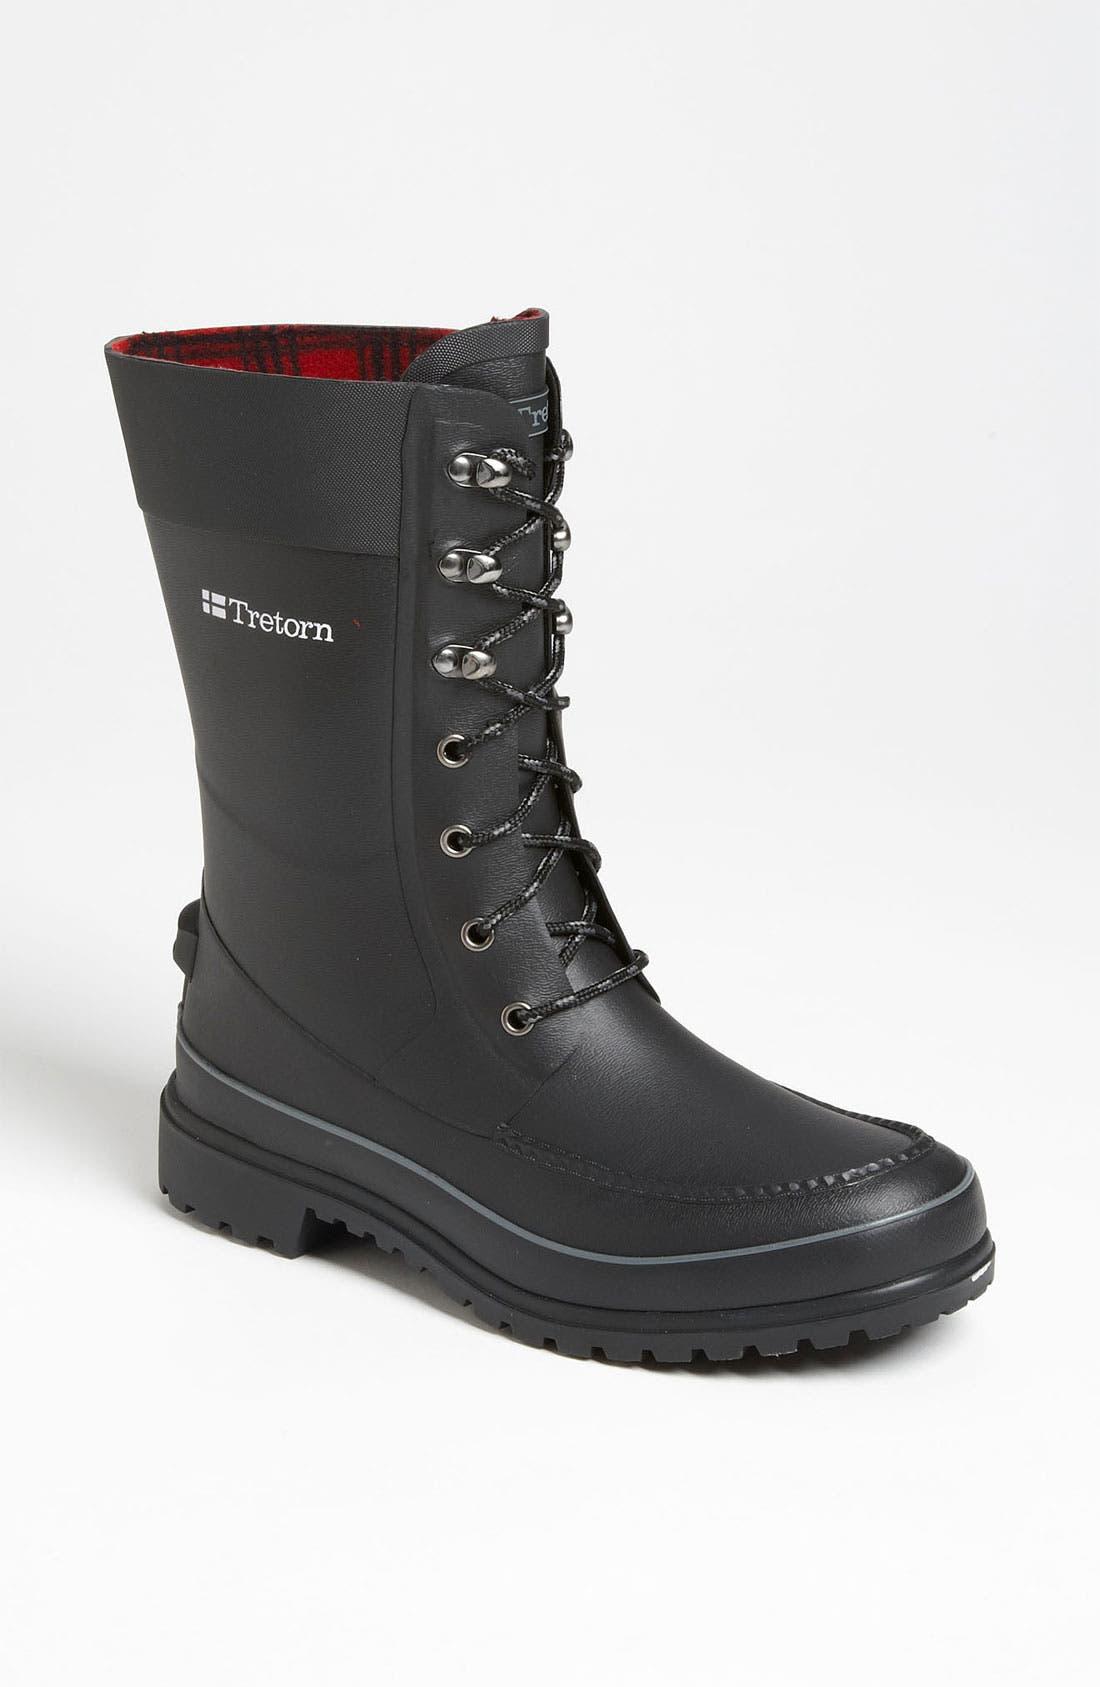 Main Image - Tretorn 'Bomanbeck' Snow Boot